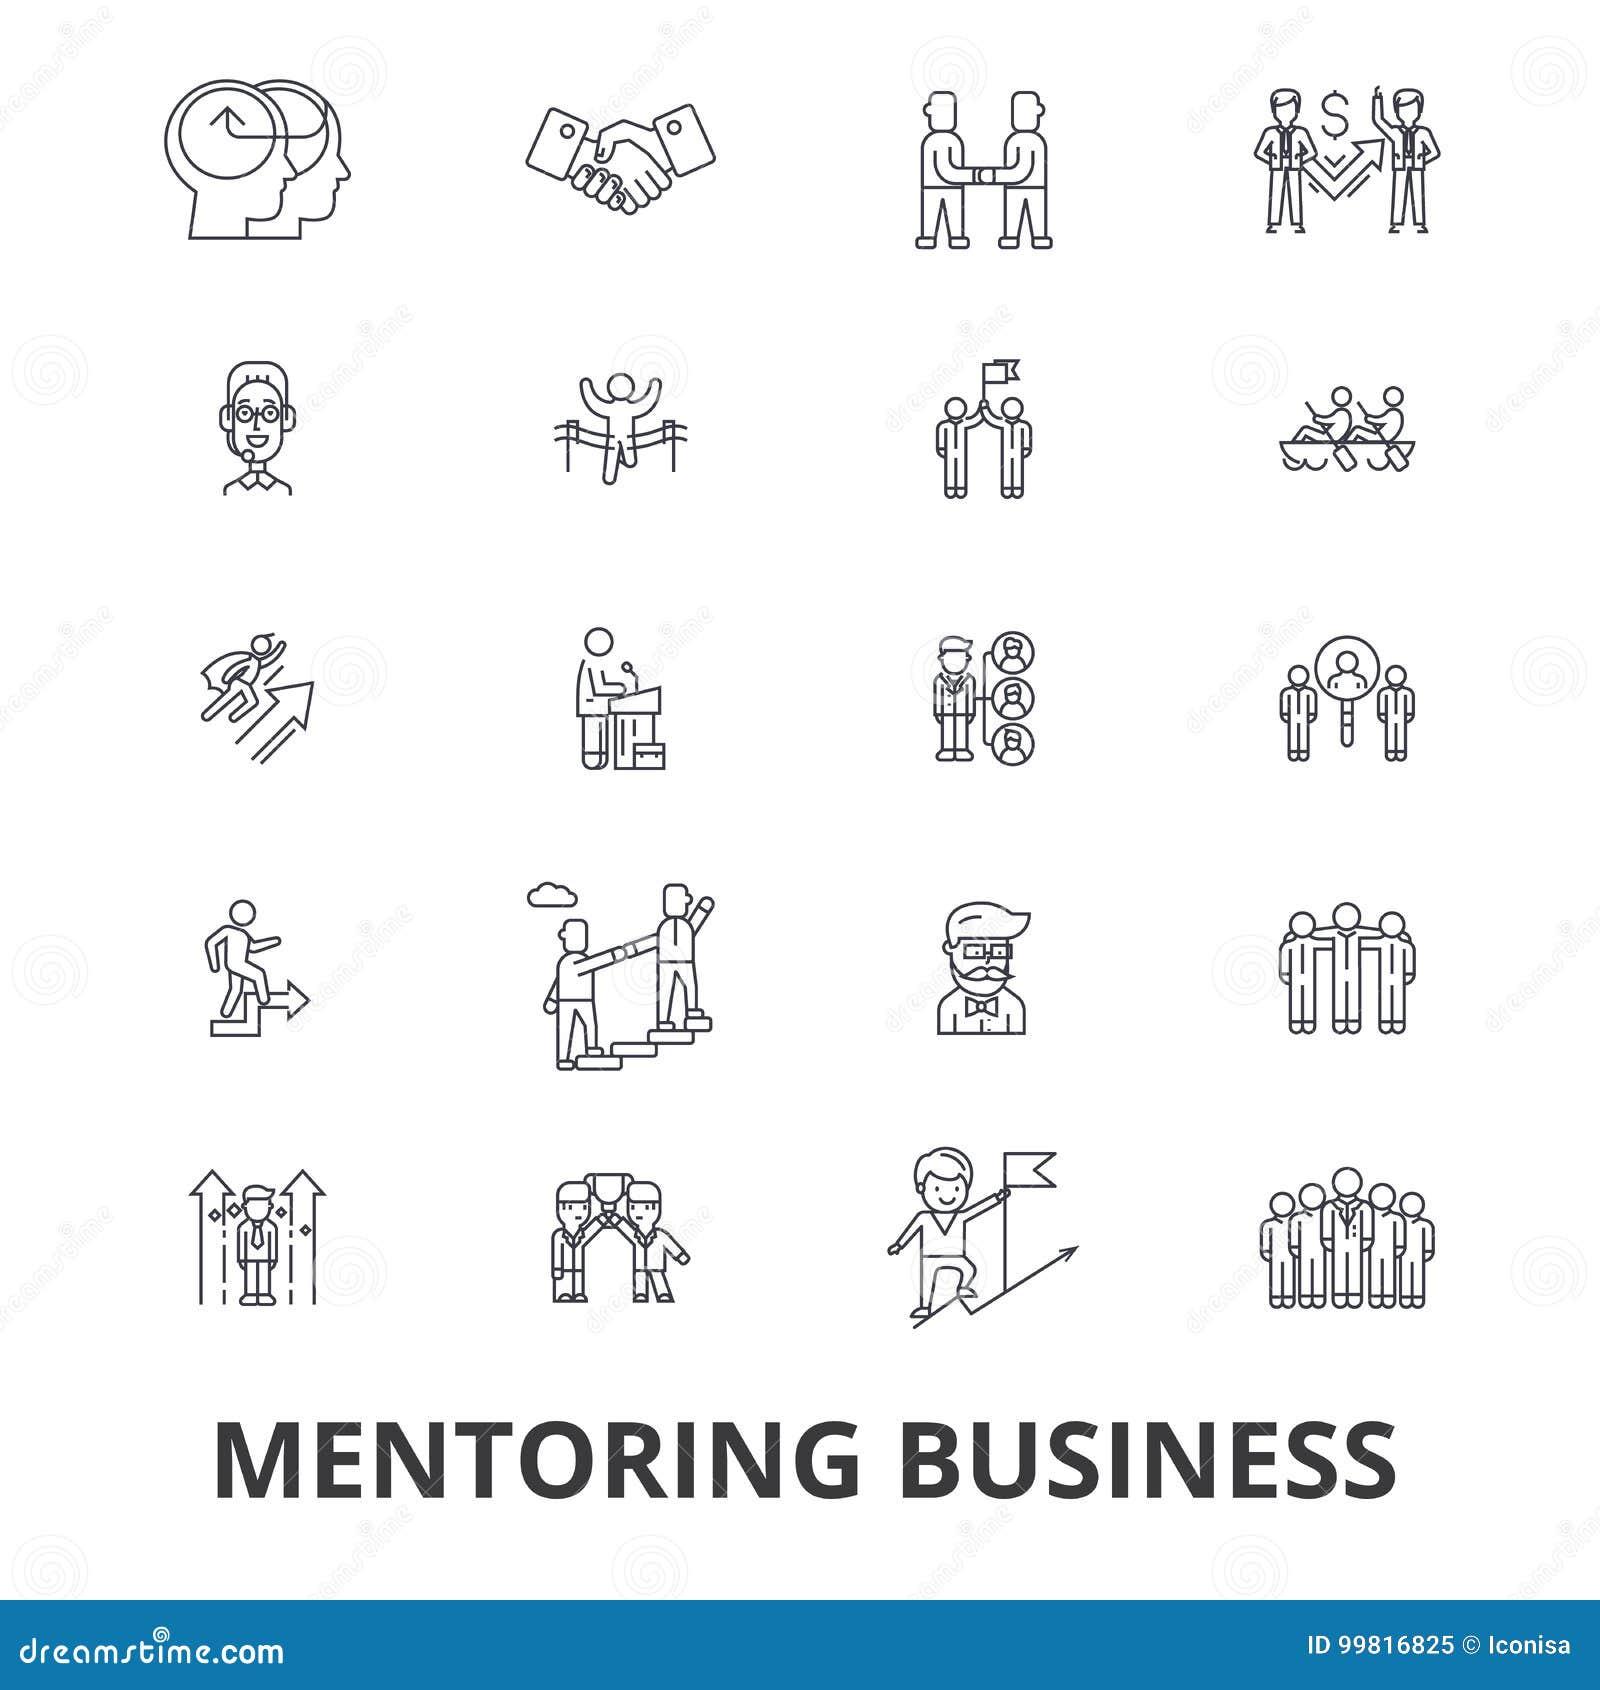 Mentoring επιχείρηση, σύμβουλος, προγύμναση, επιχειρησιακή καθοδήγηση, τραίνο, βοήθεια, εικονίδια γραμμών ομαδικής εργασίας Κτυπή